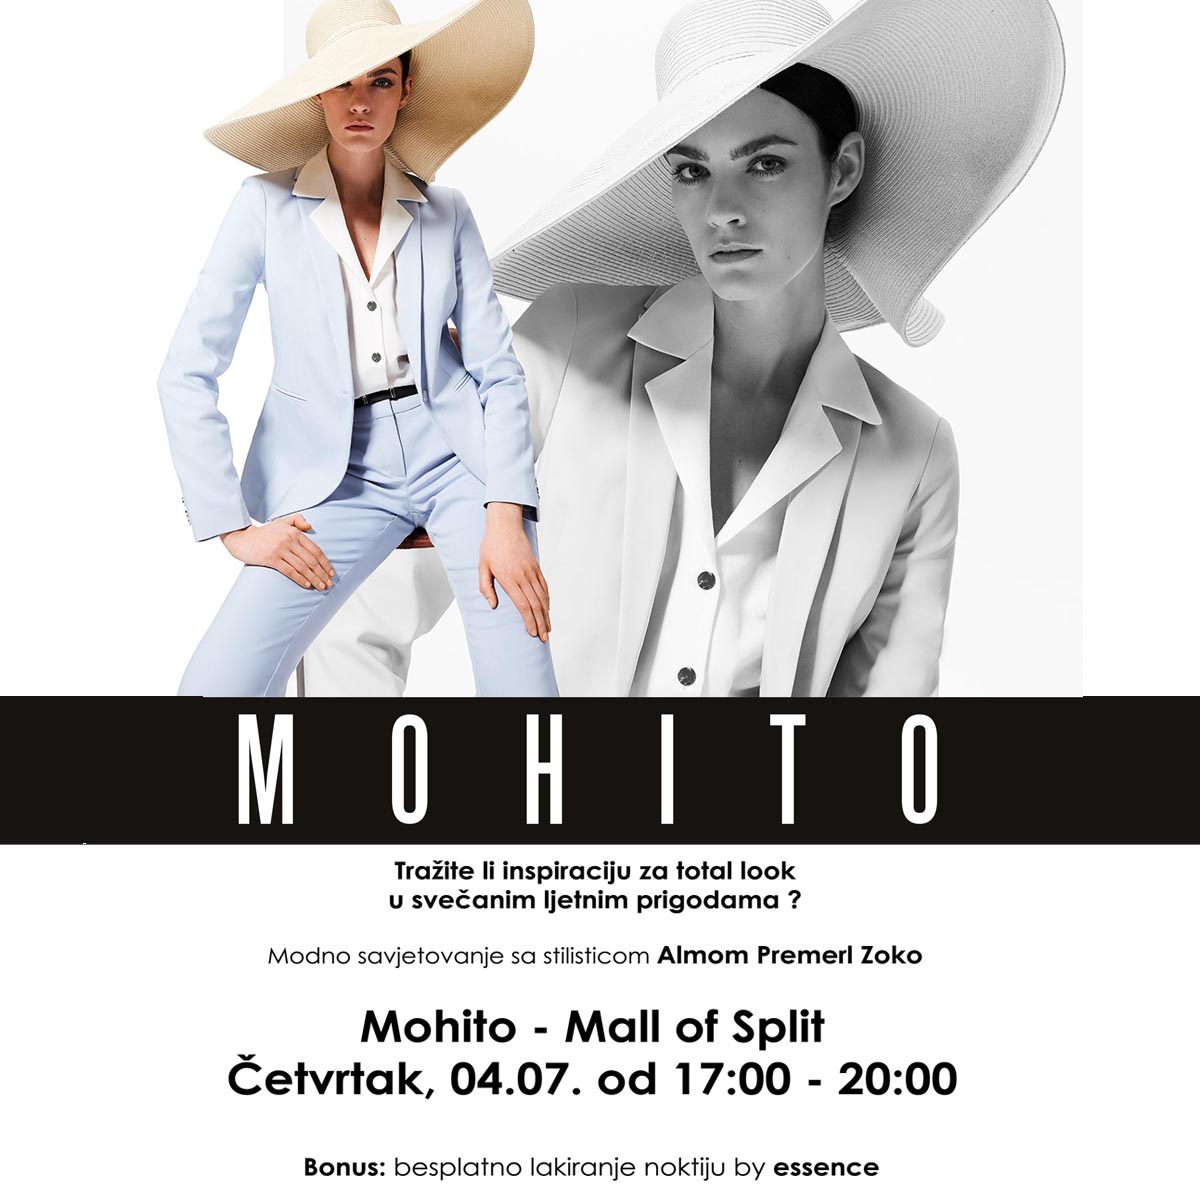 mohito-split-04-07-2019-1200x1200